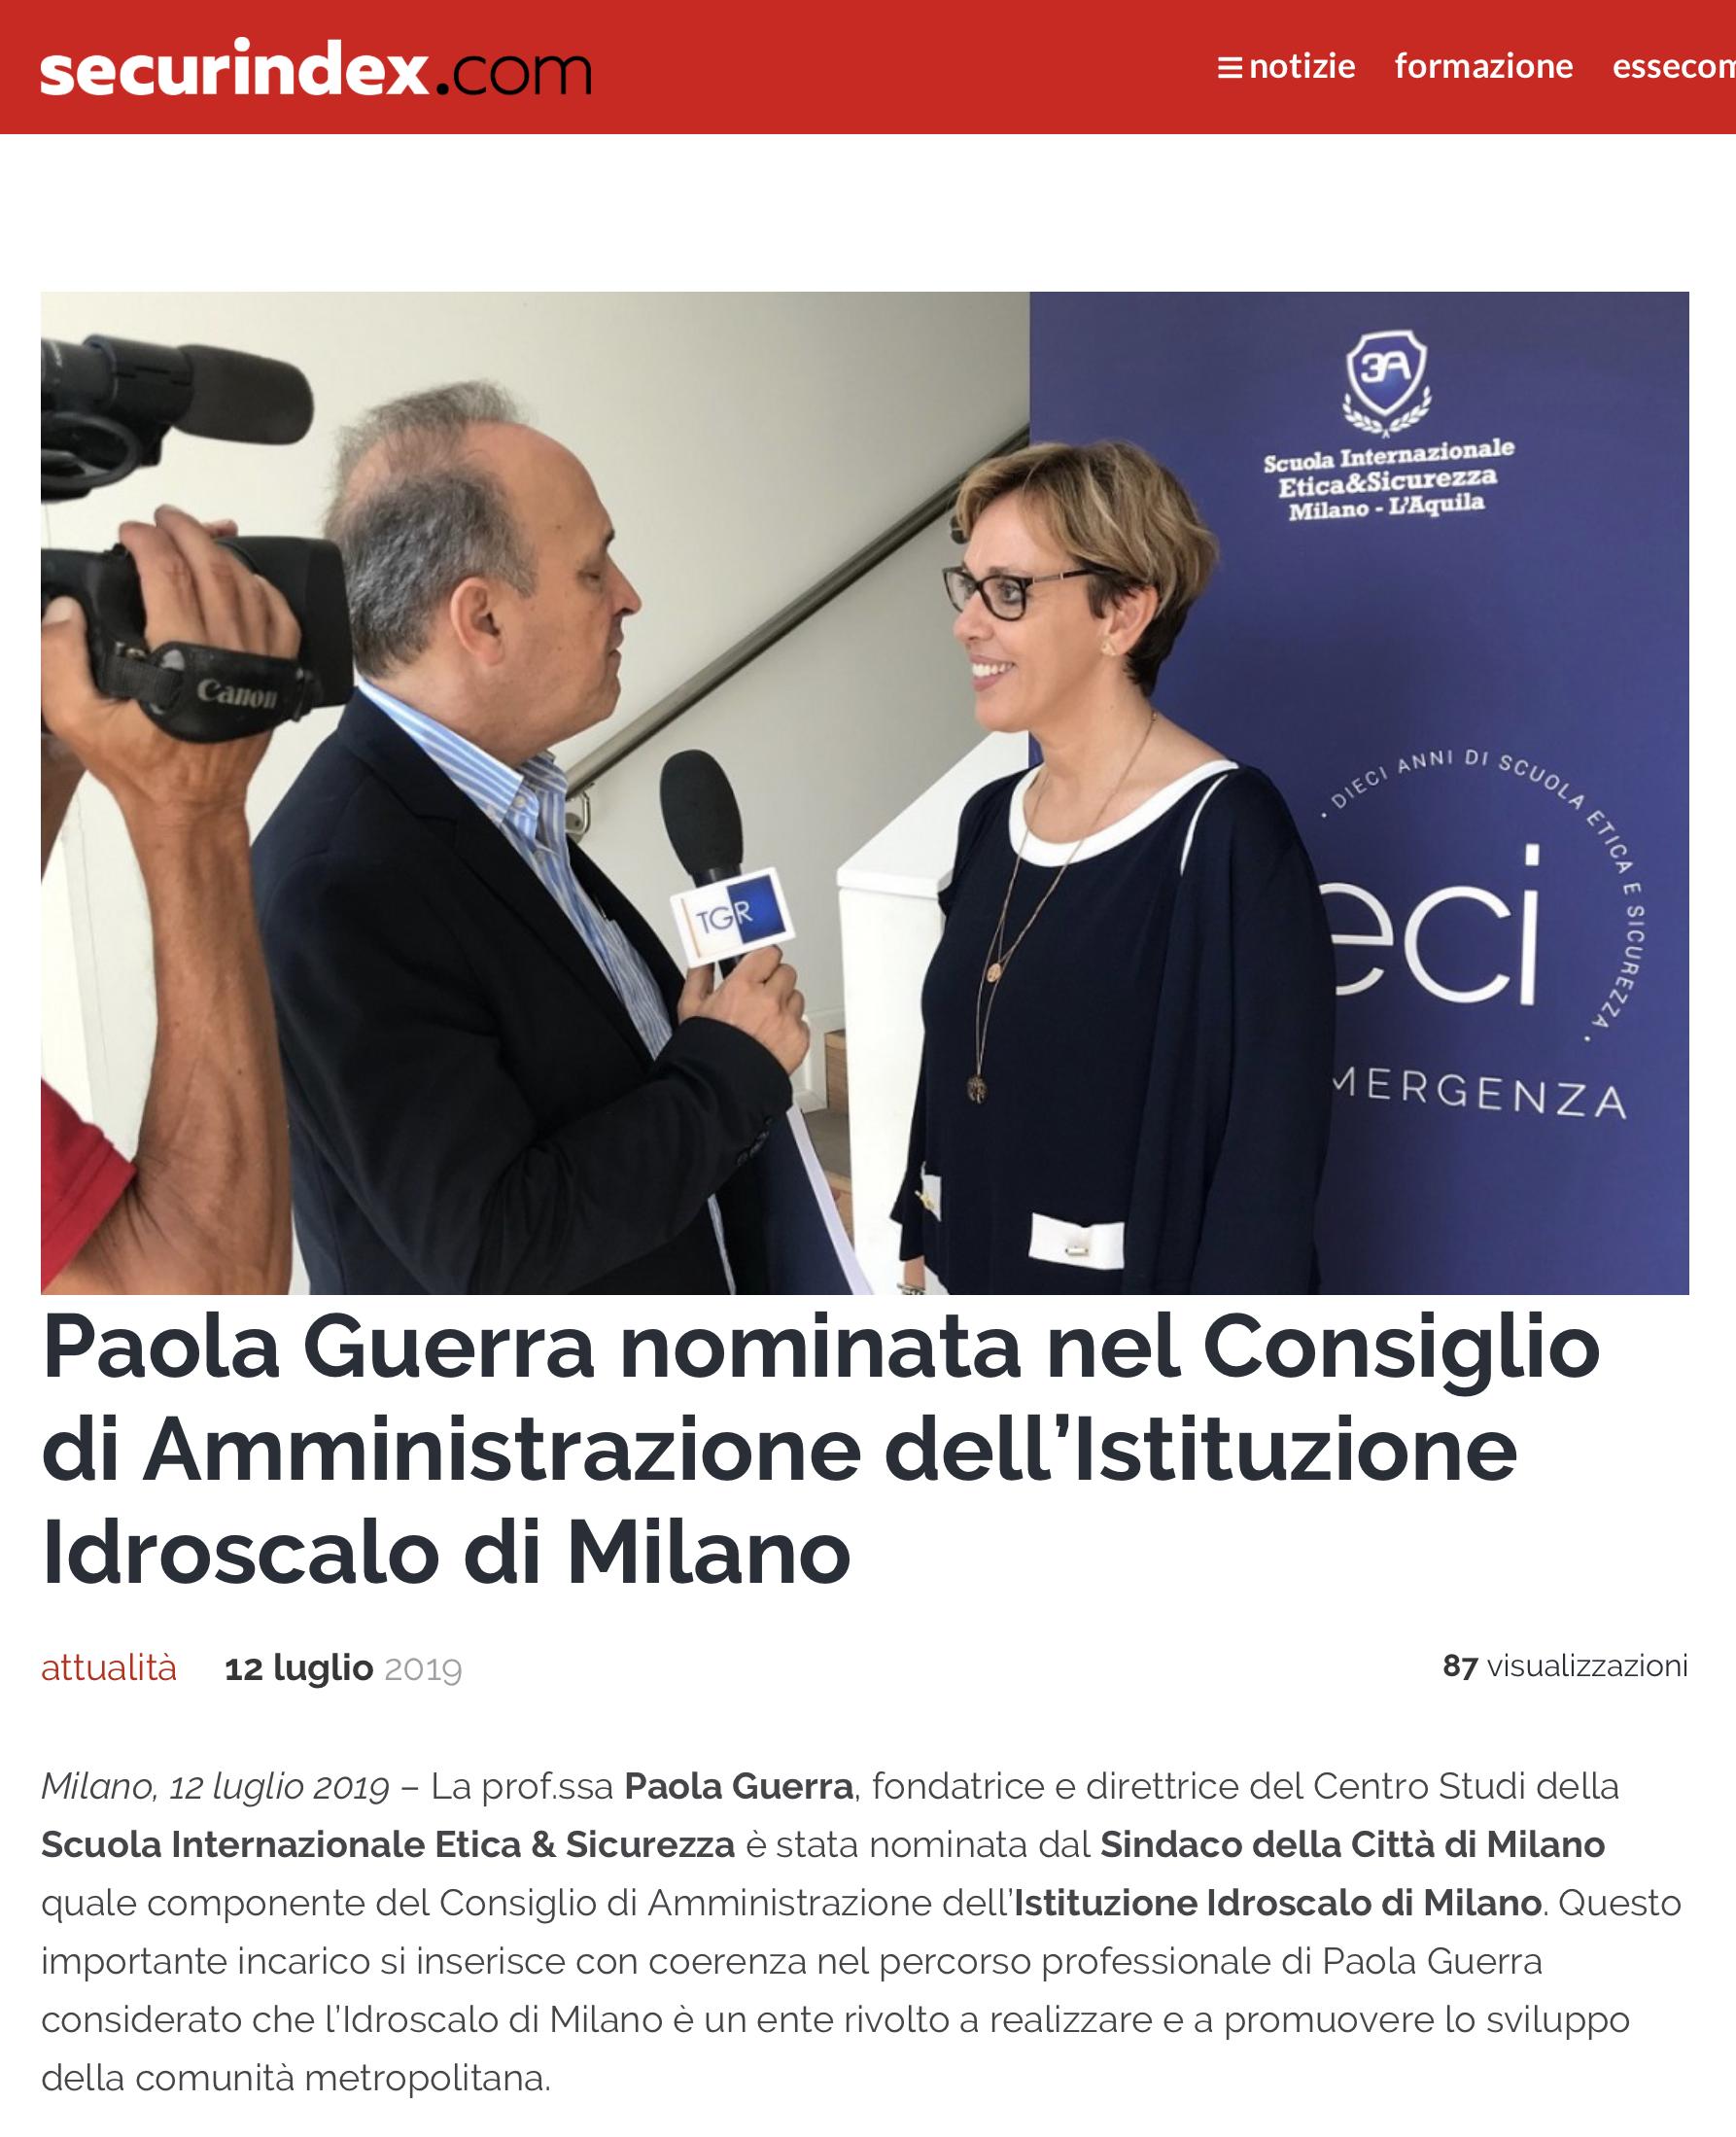 Nomina Paola Guerra - securindex